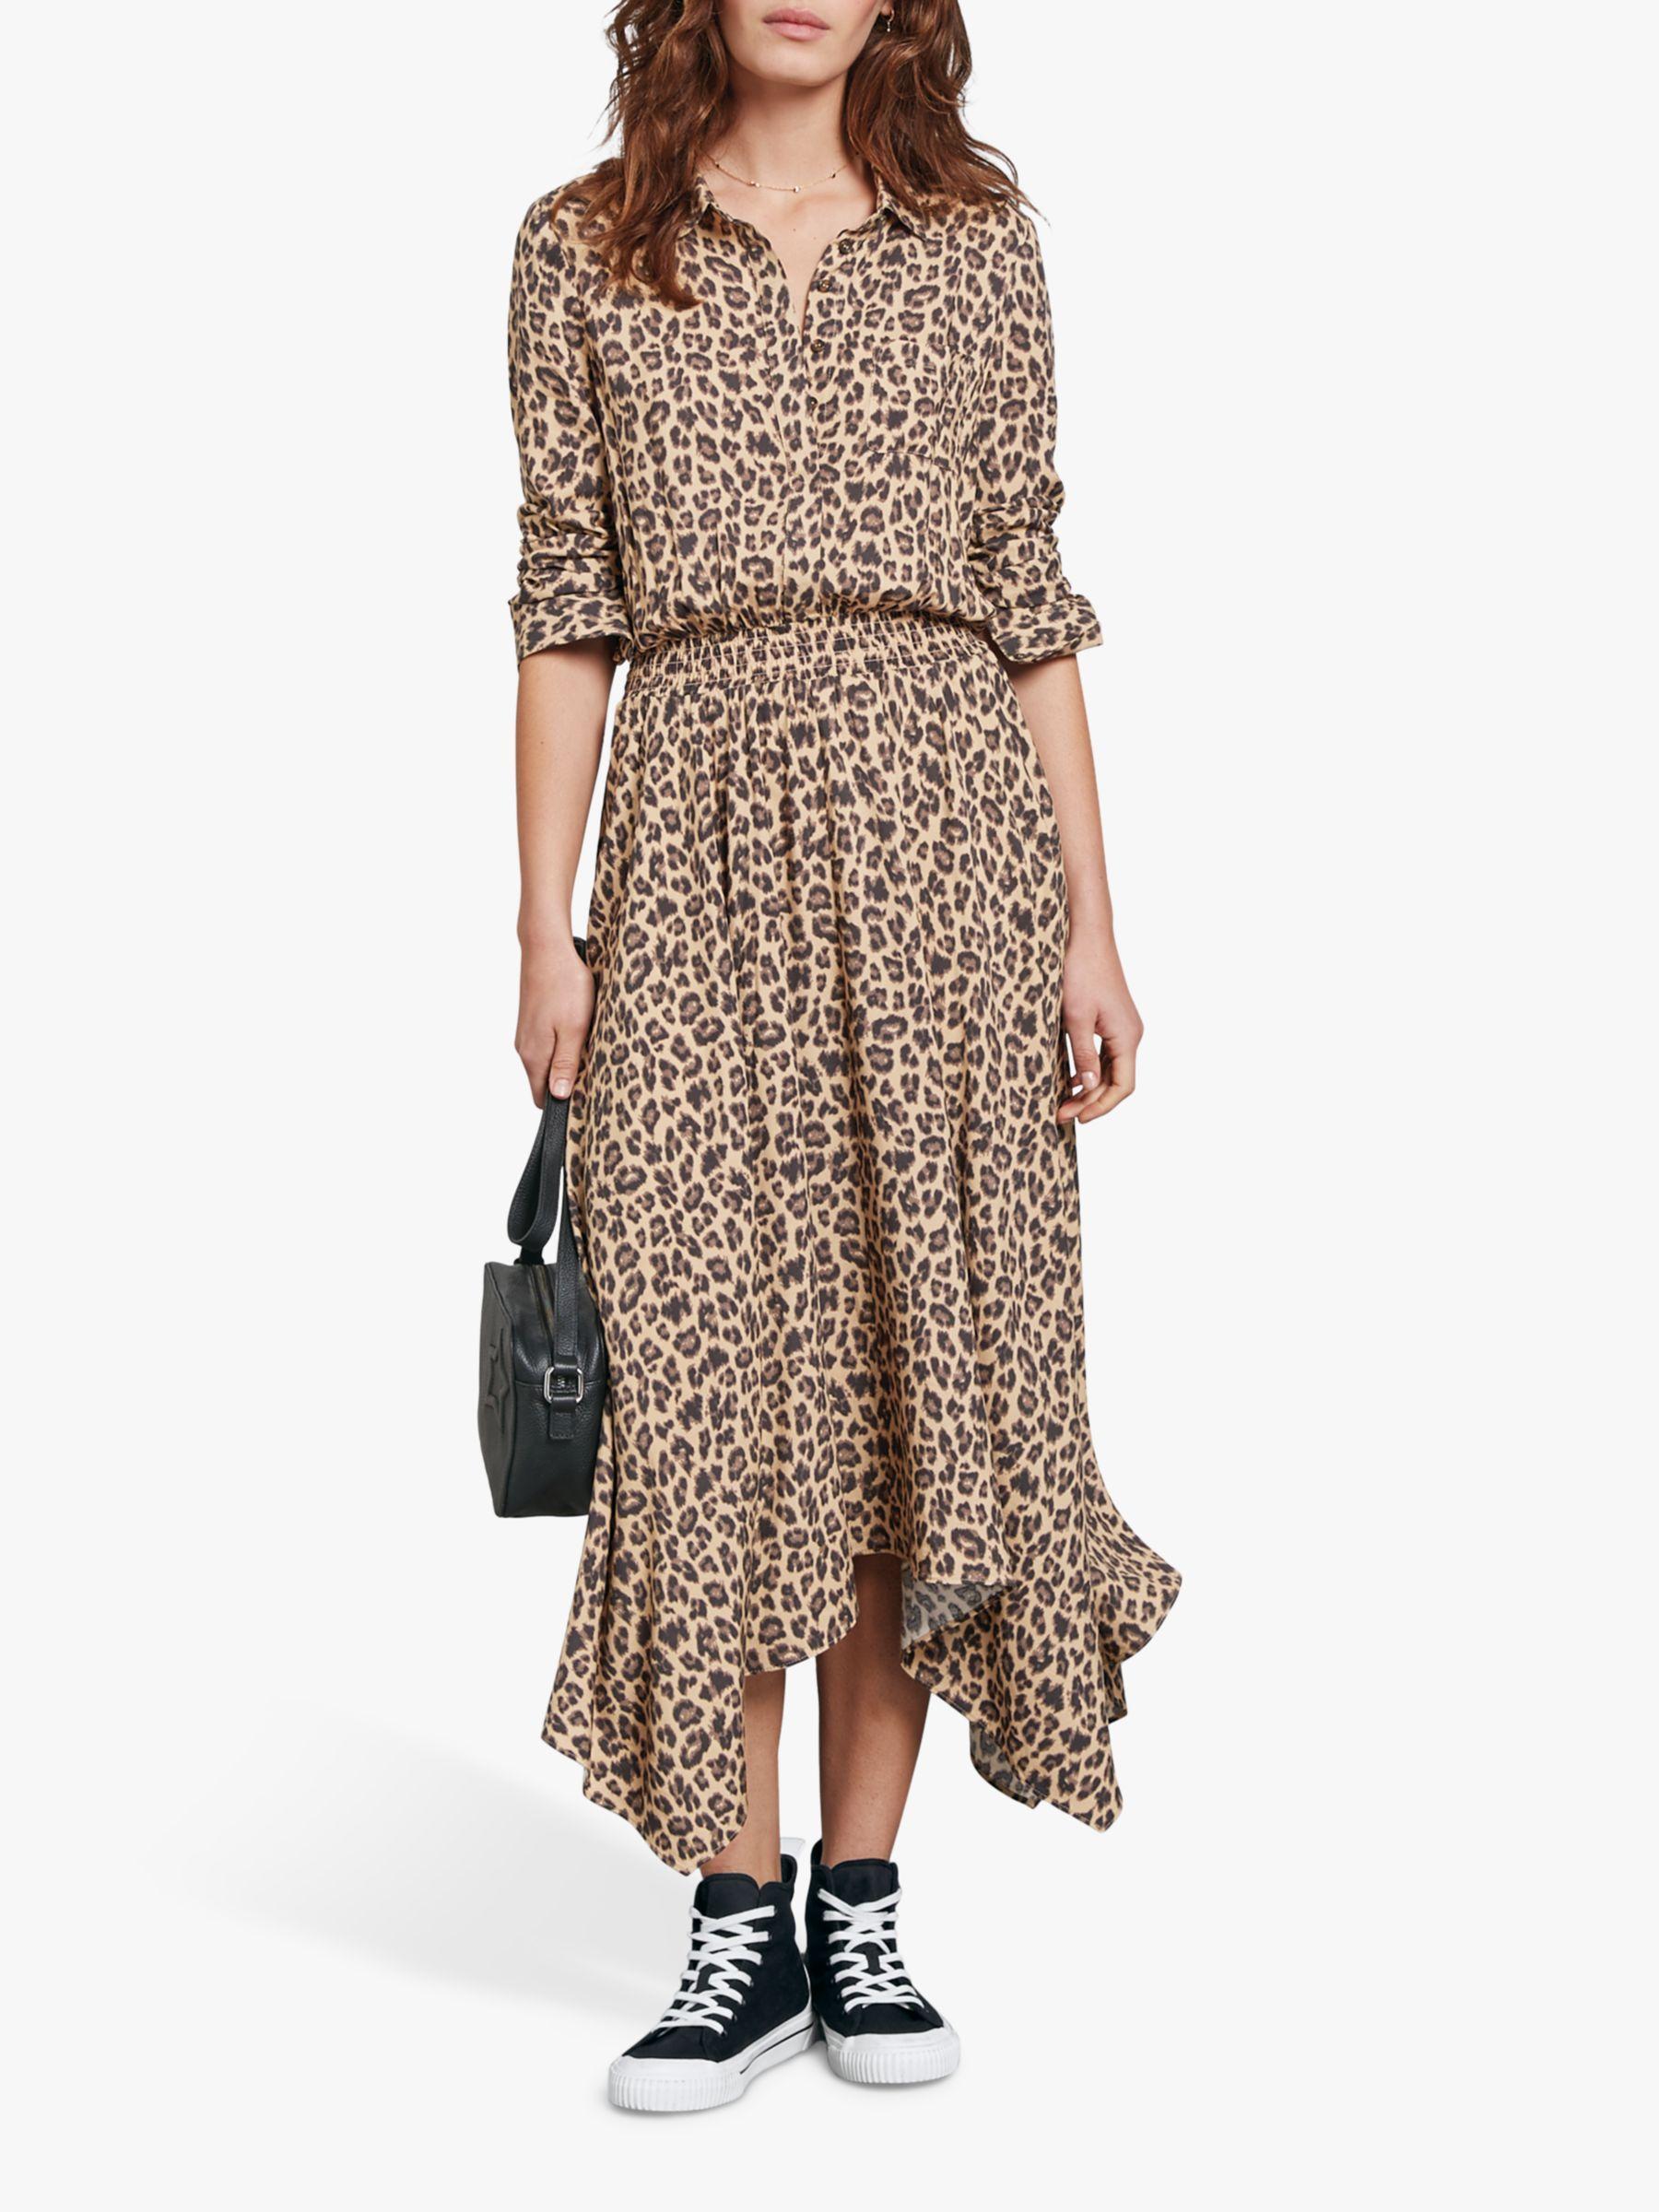 Women Leopard Print Midi Dress Lady Long Sleeve V Neck Party Wrap Shirt Dress UK